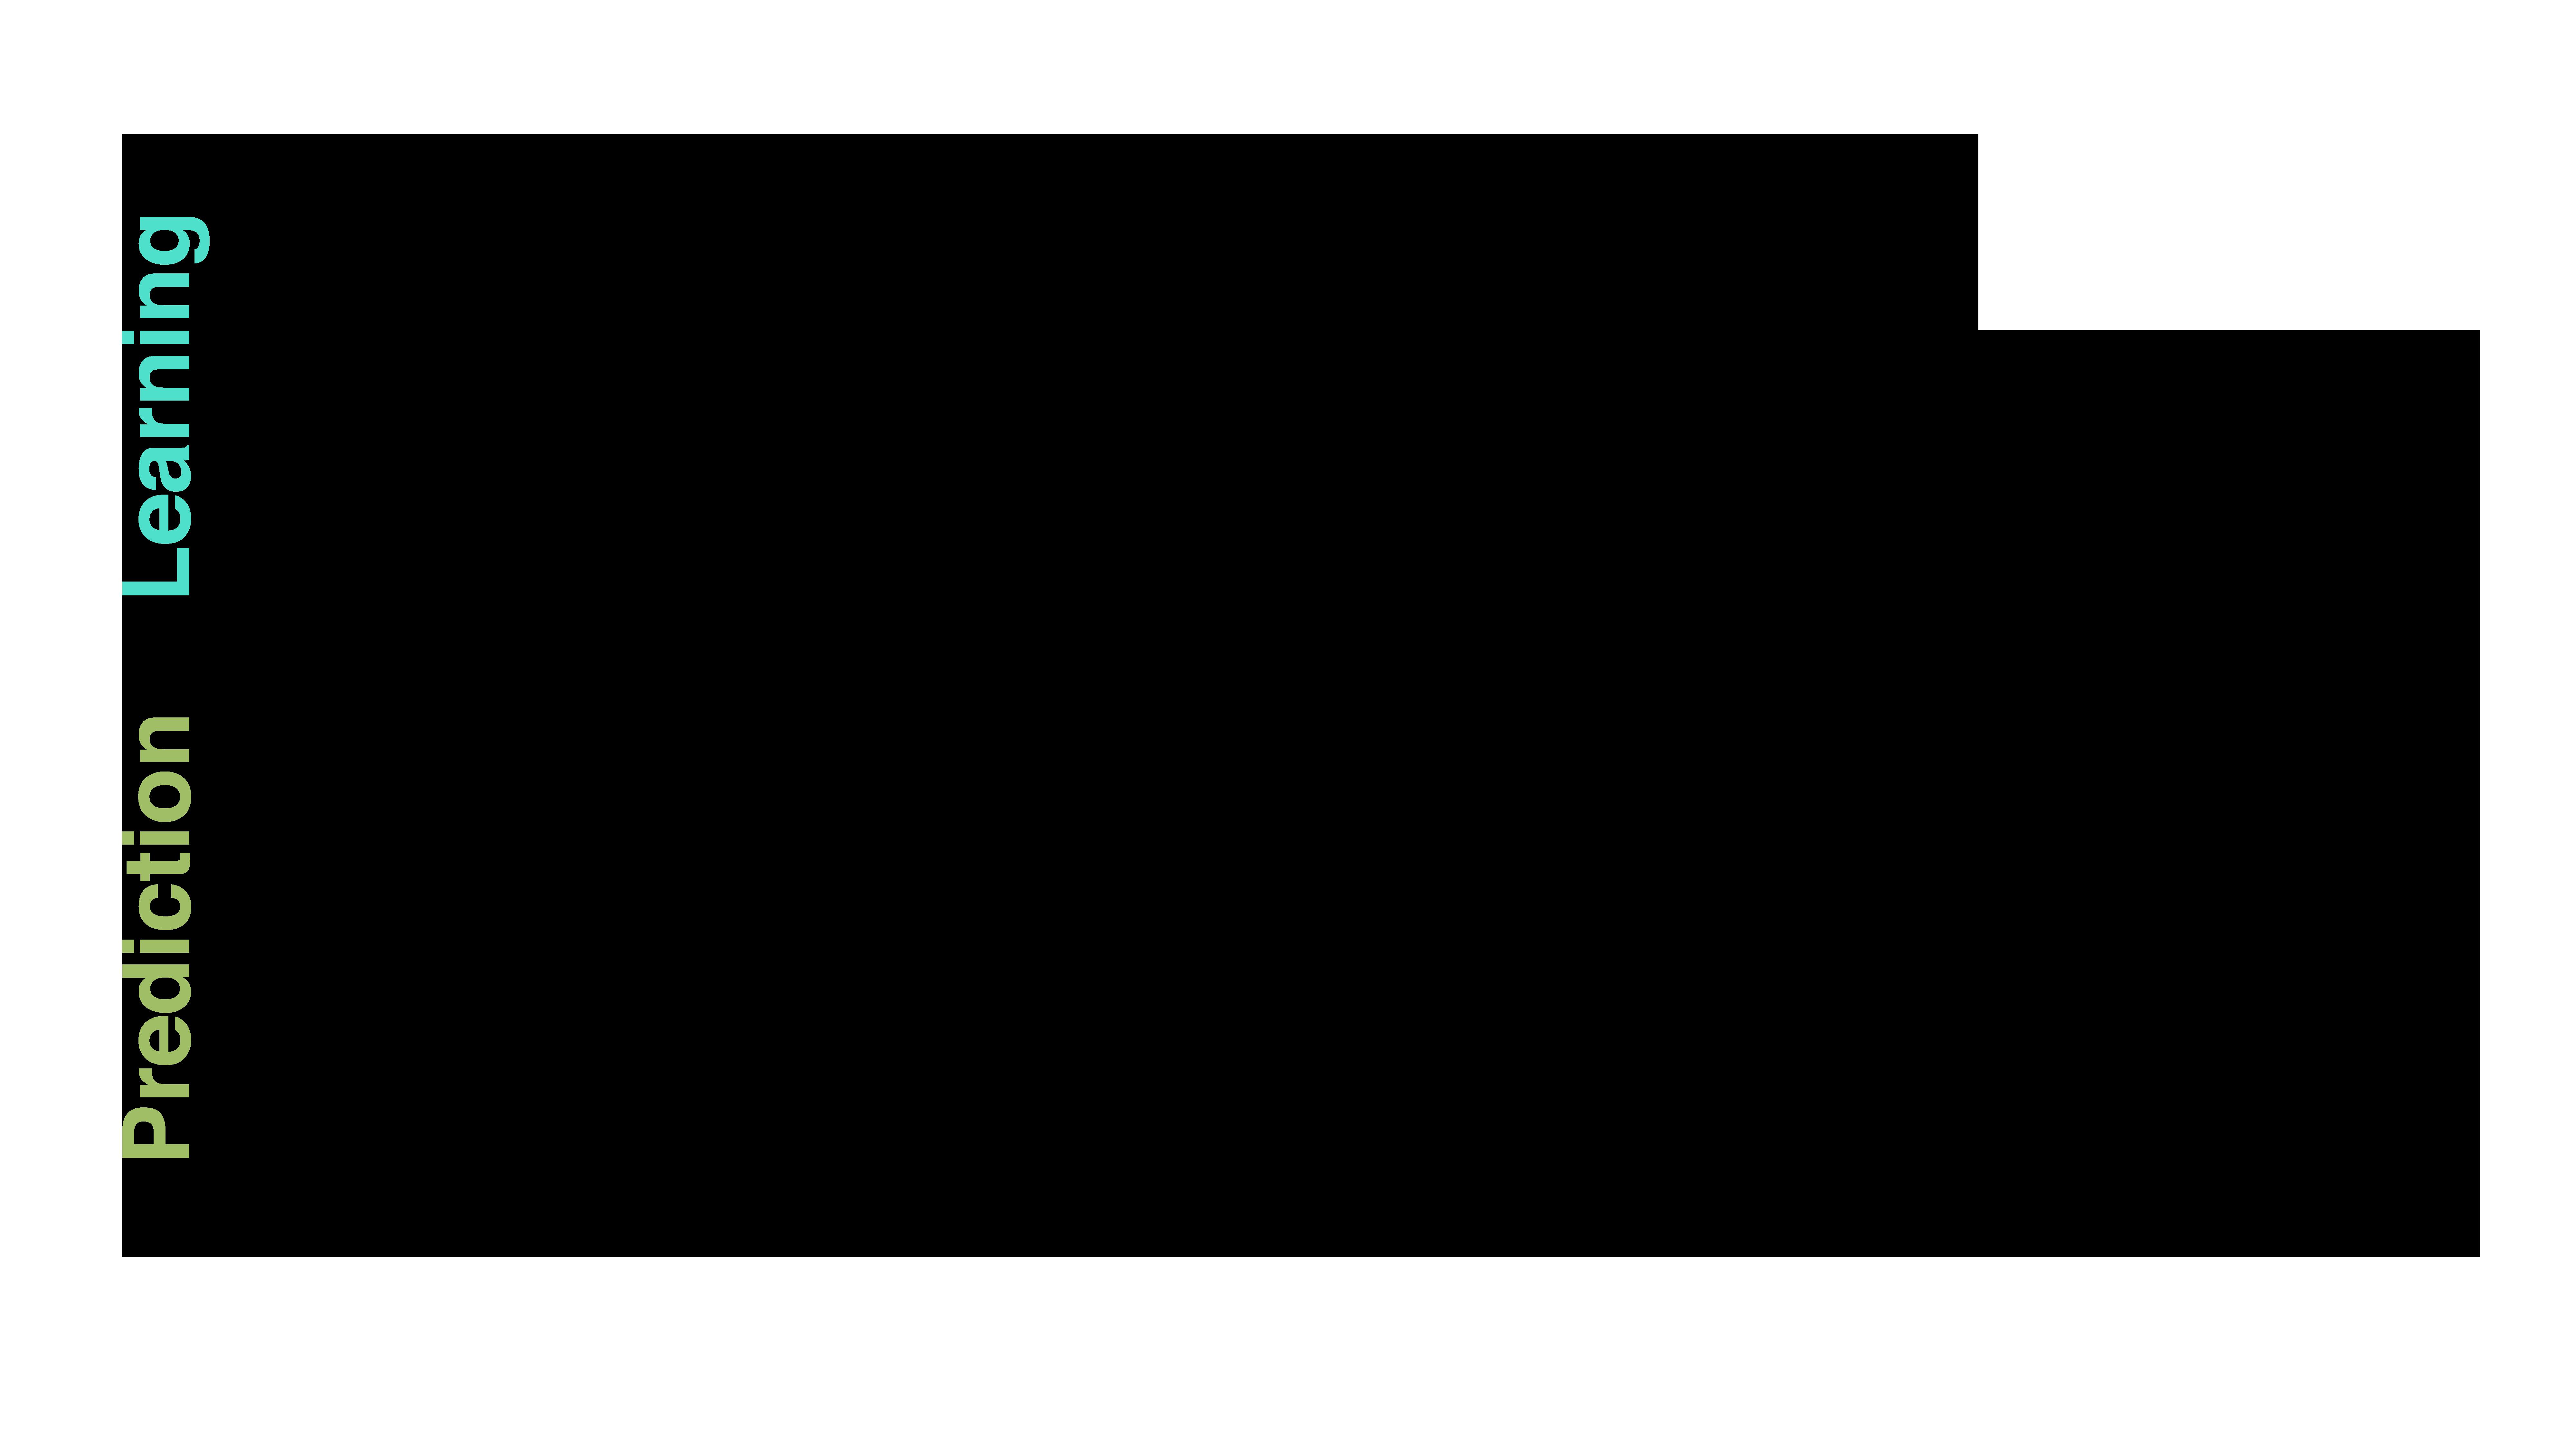 MLapproach-01-blackbg